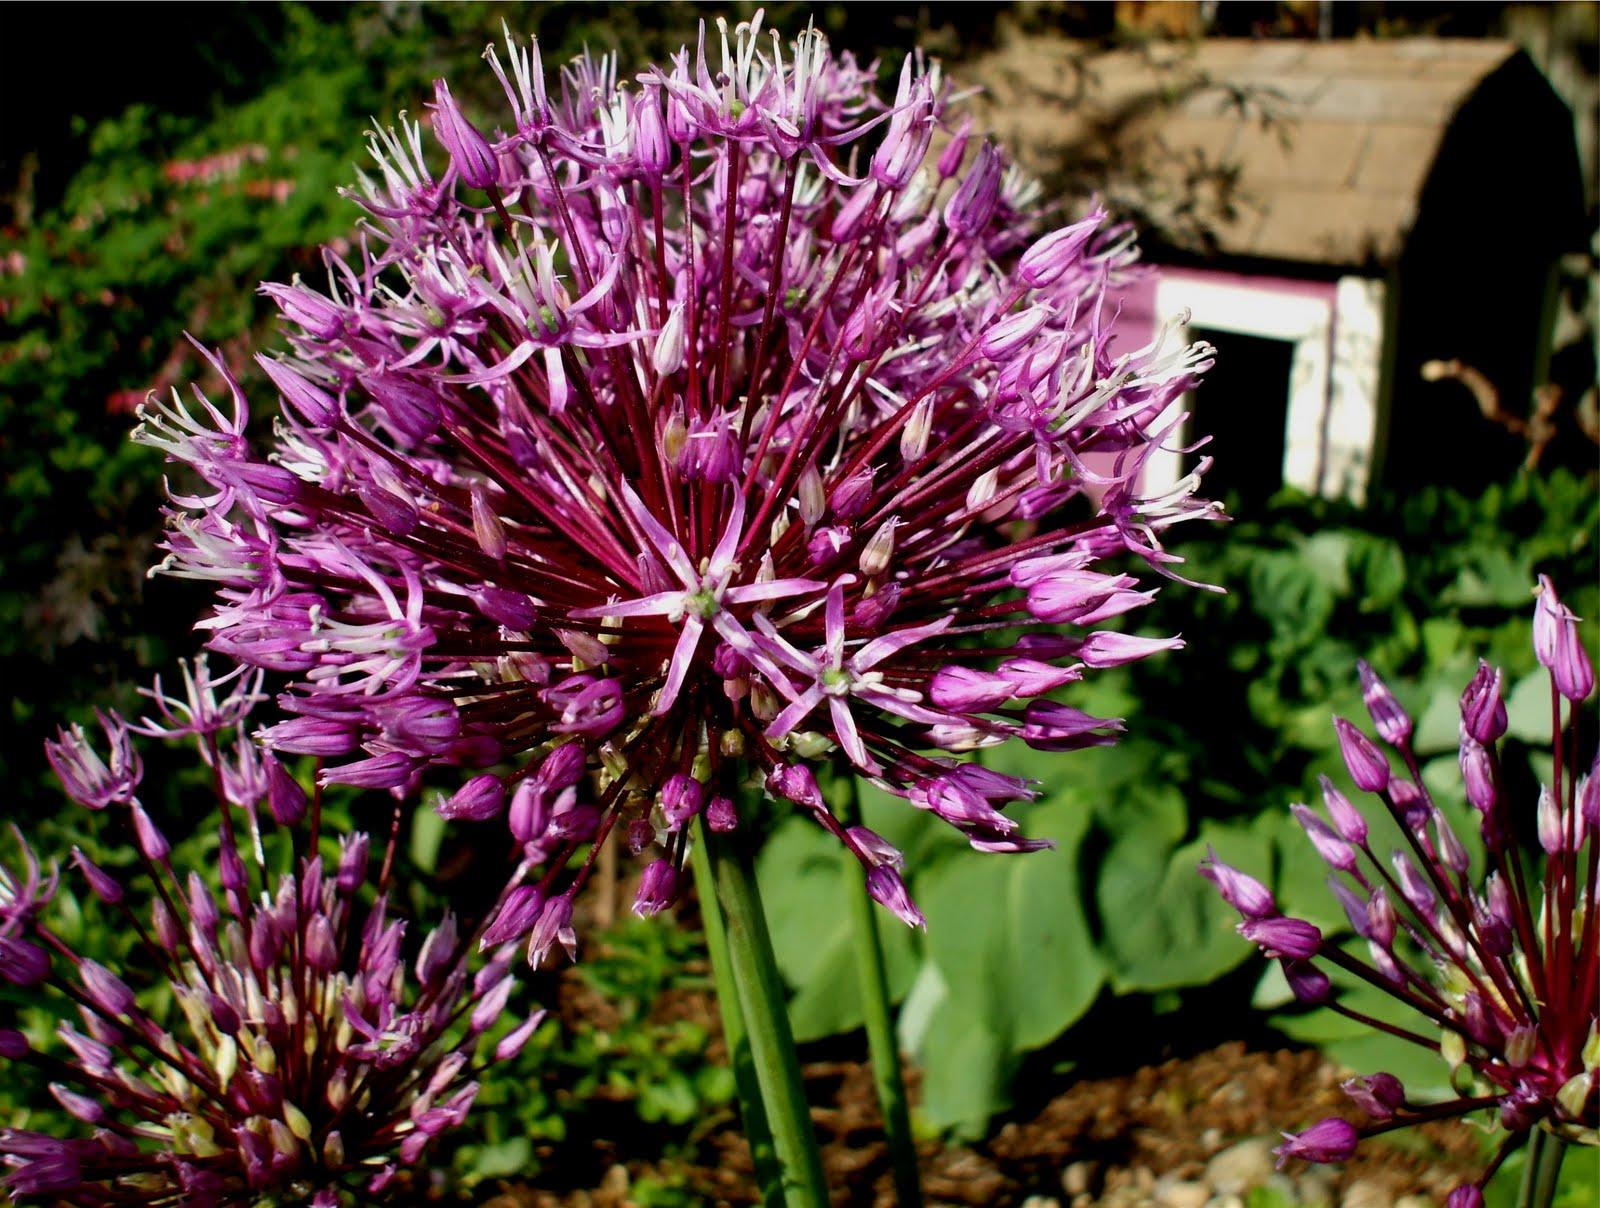 A Rose in the Garden Allium